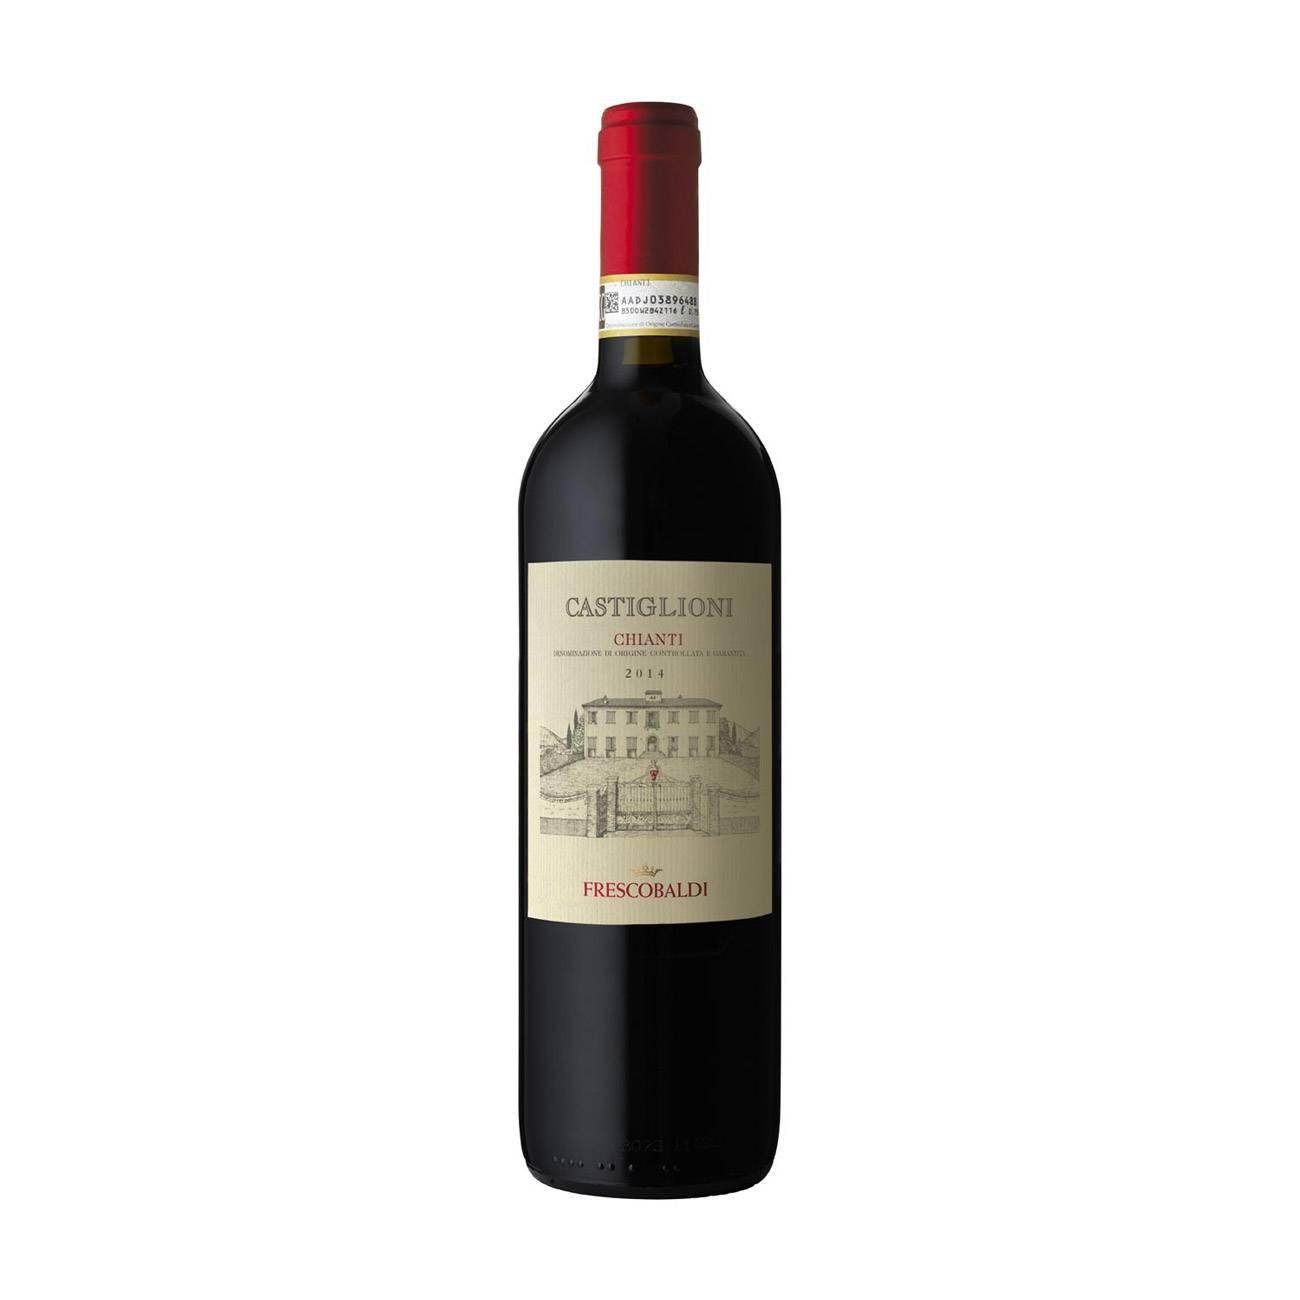 Vinuri, Castiglioni Chianti 750 Ml, FRESCOBALDI